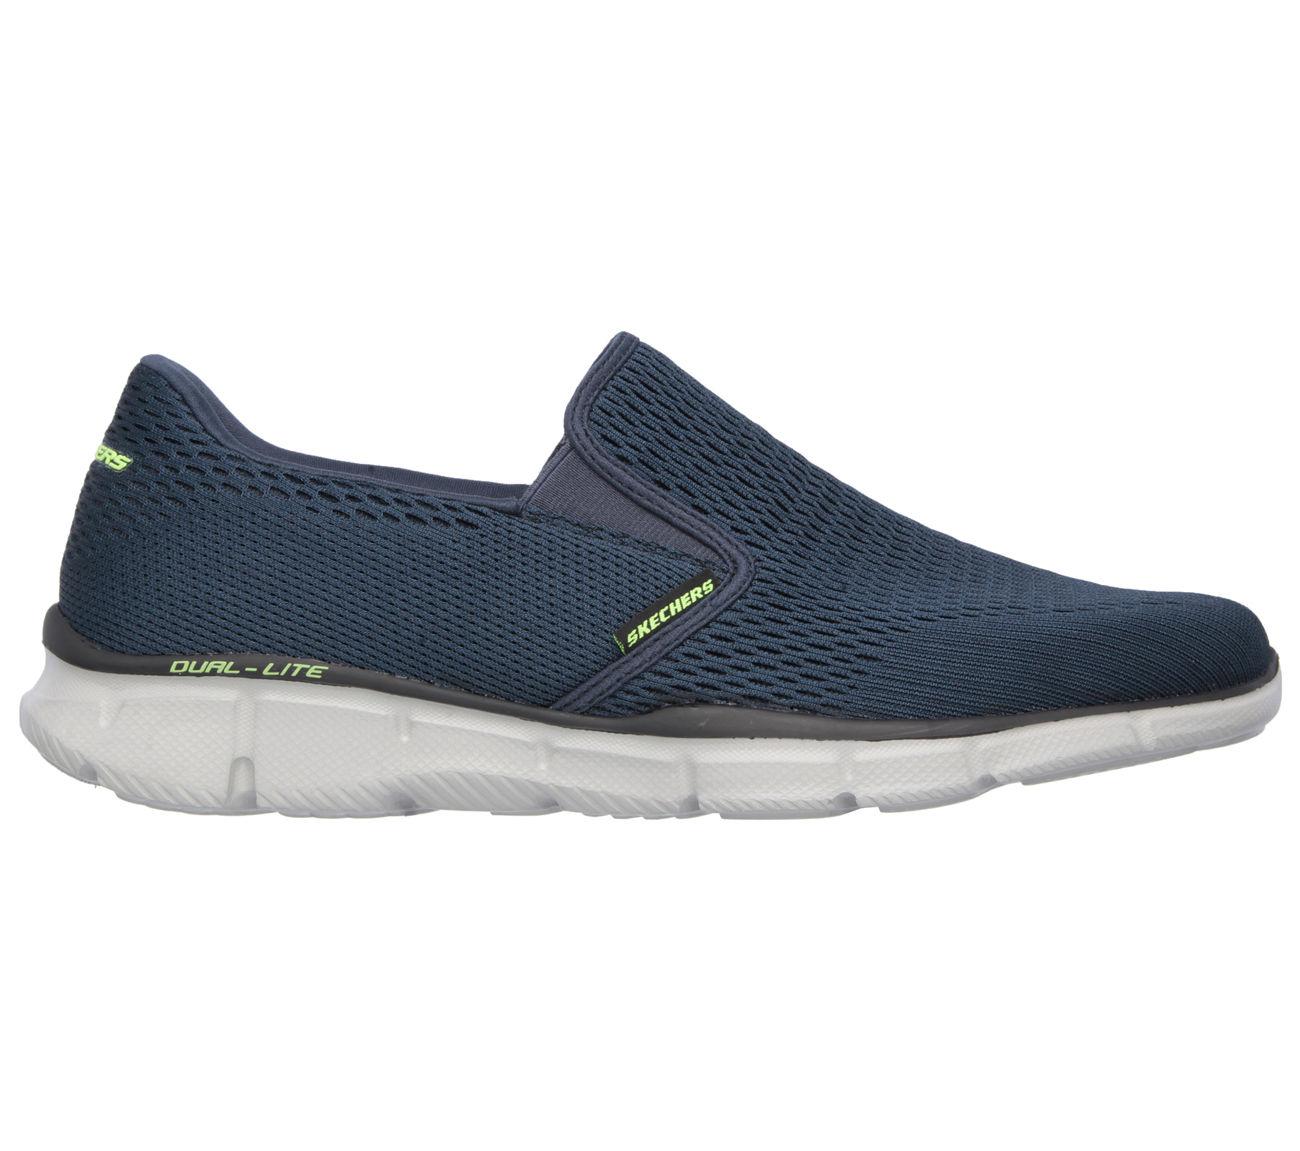 Mens Slip On Hiking Shoe Sale